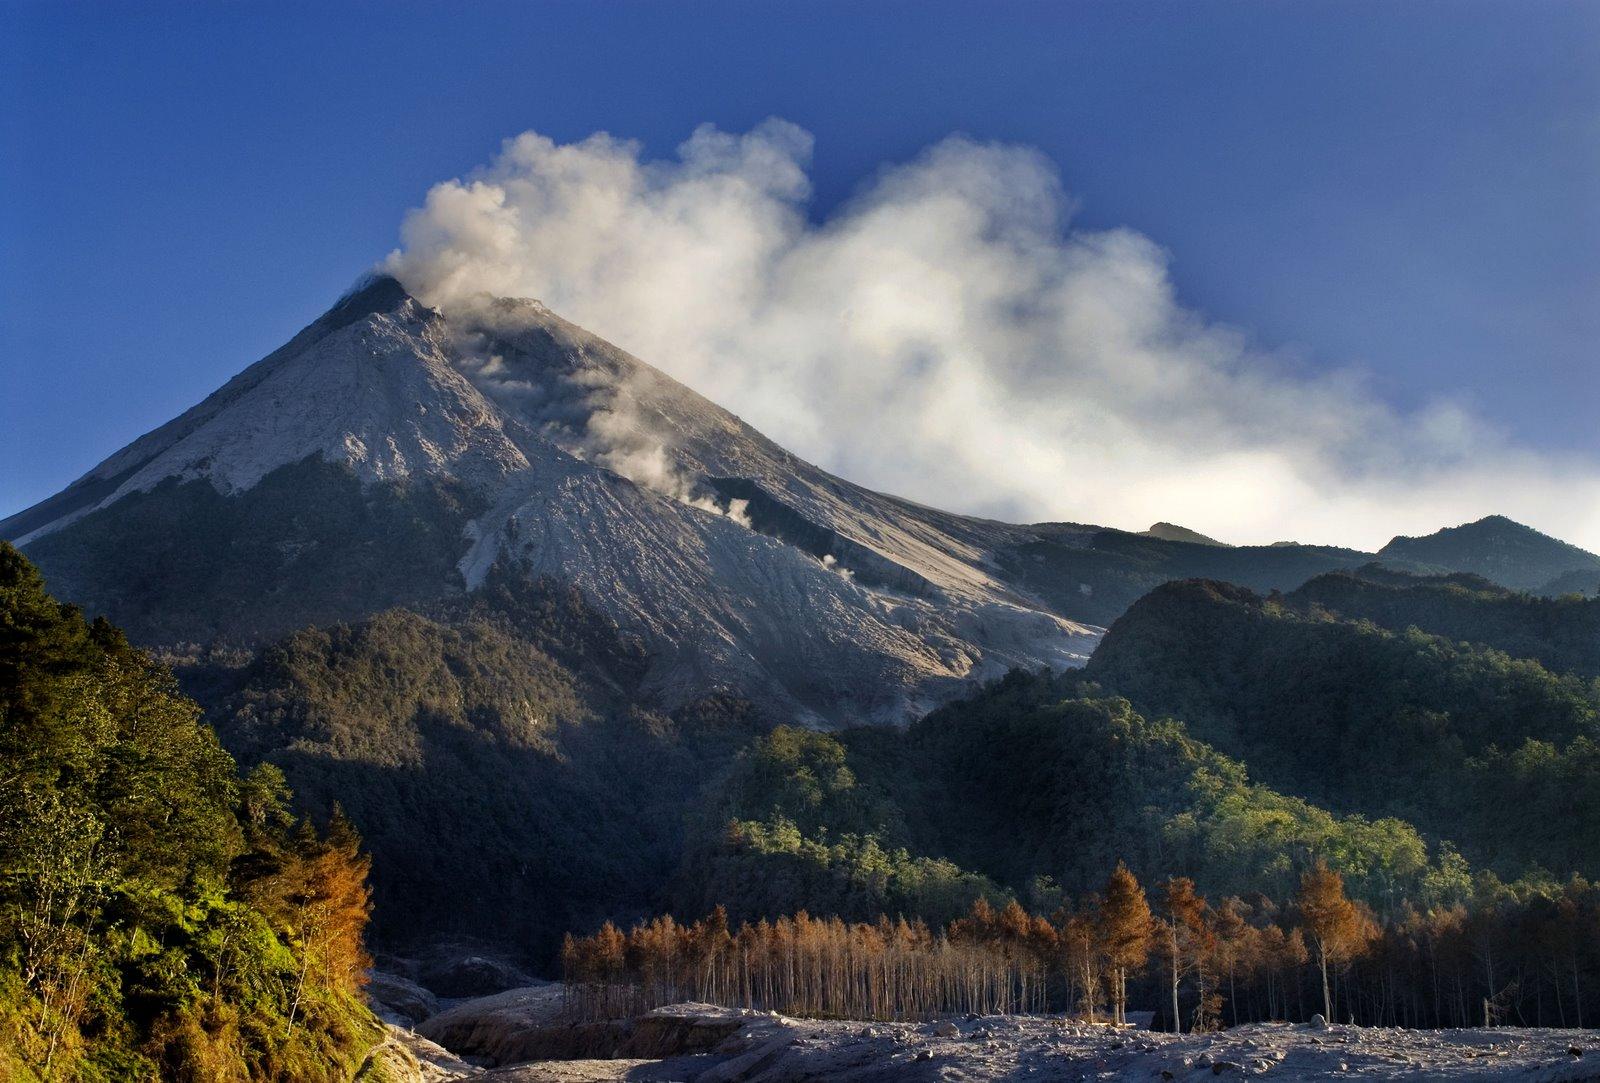 Gunung Merapi Mount Merapi, Java Island \u2013 Indonesia  Andoyoanny\u002639;s Blog